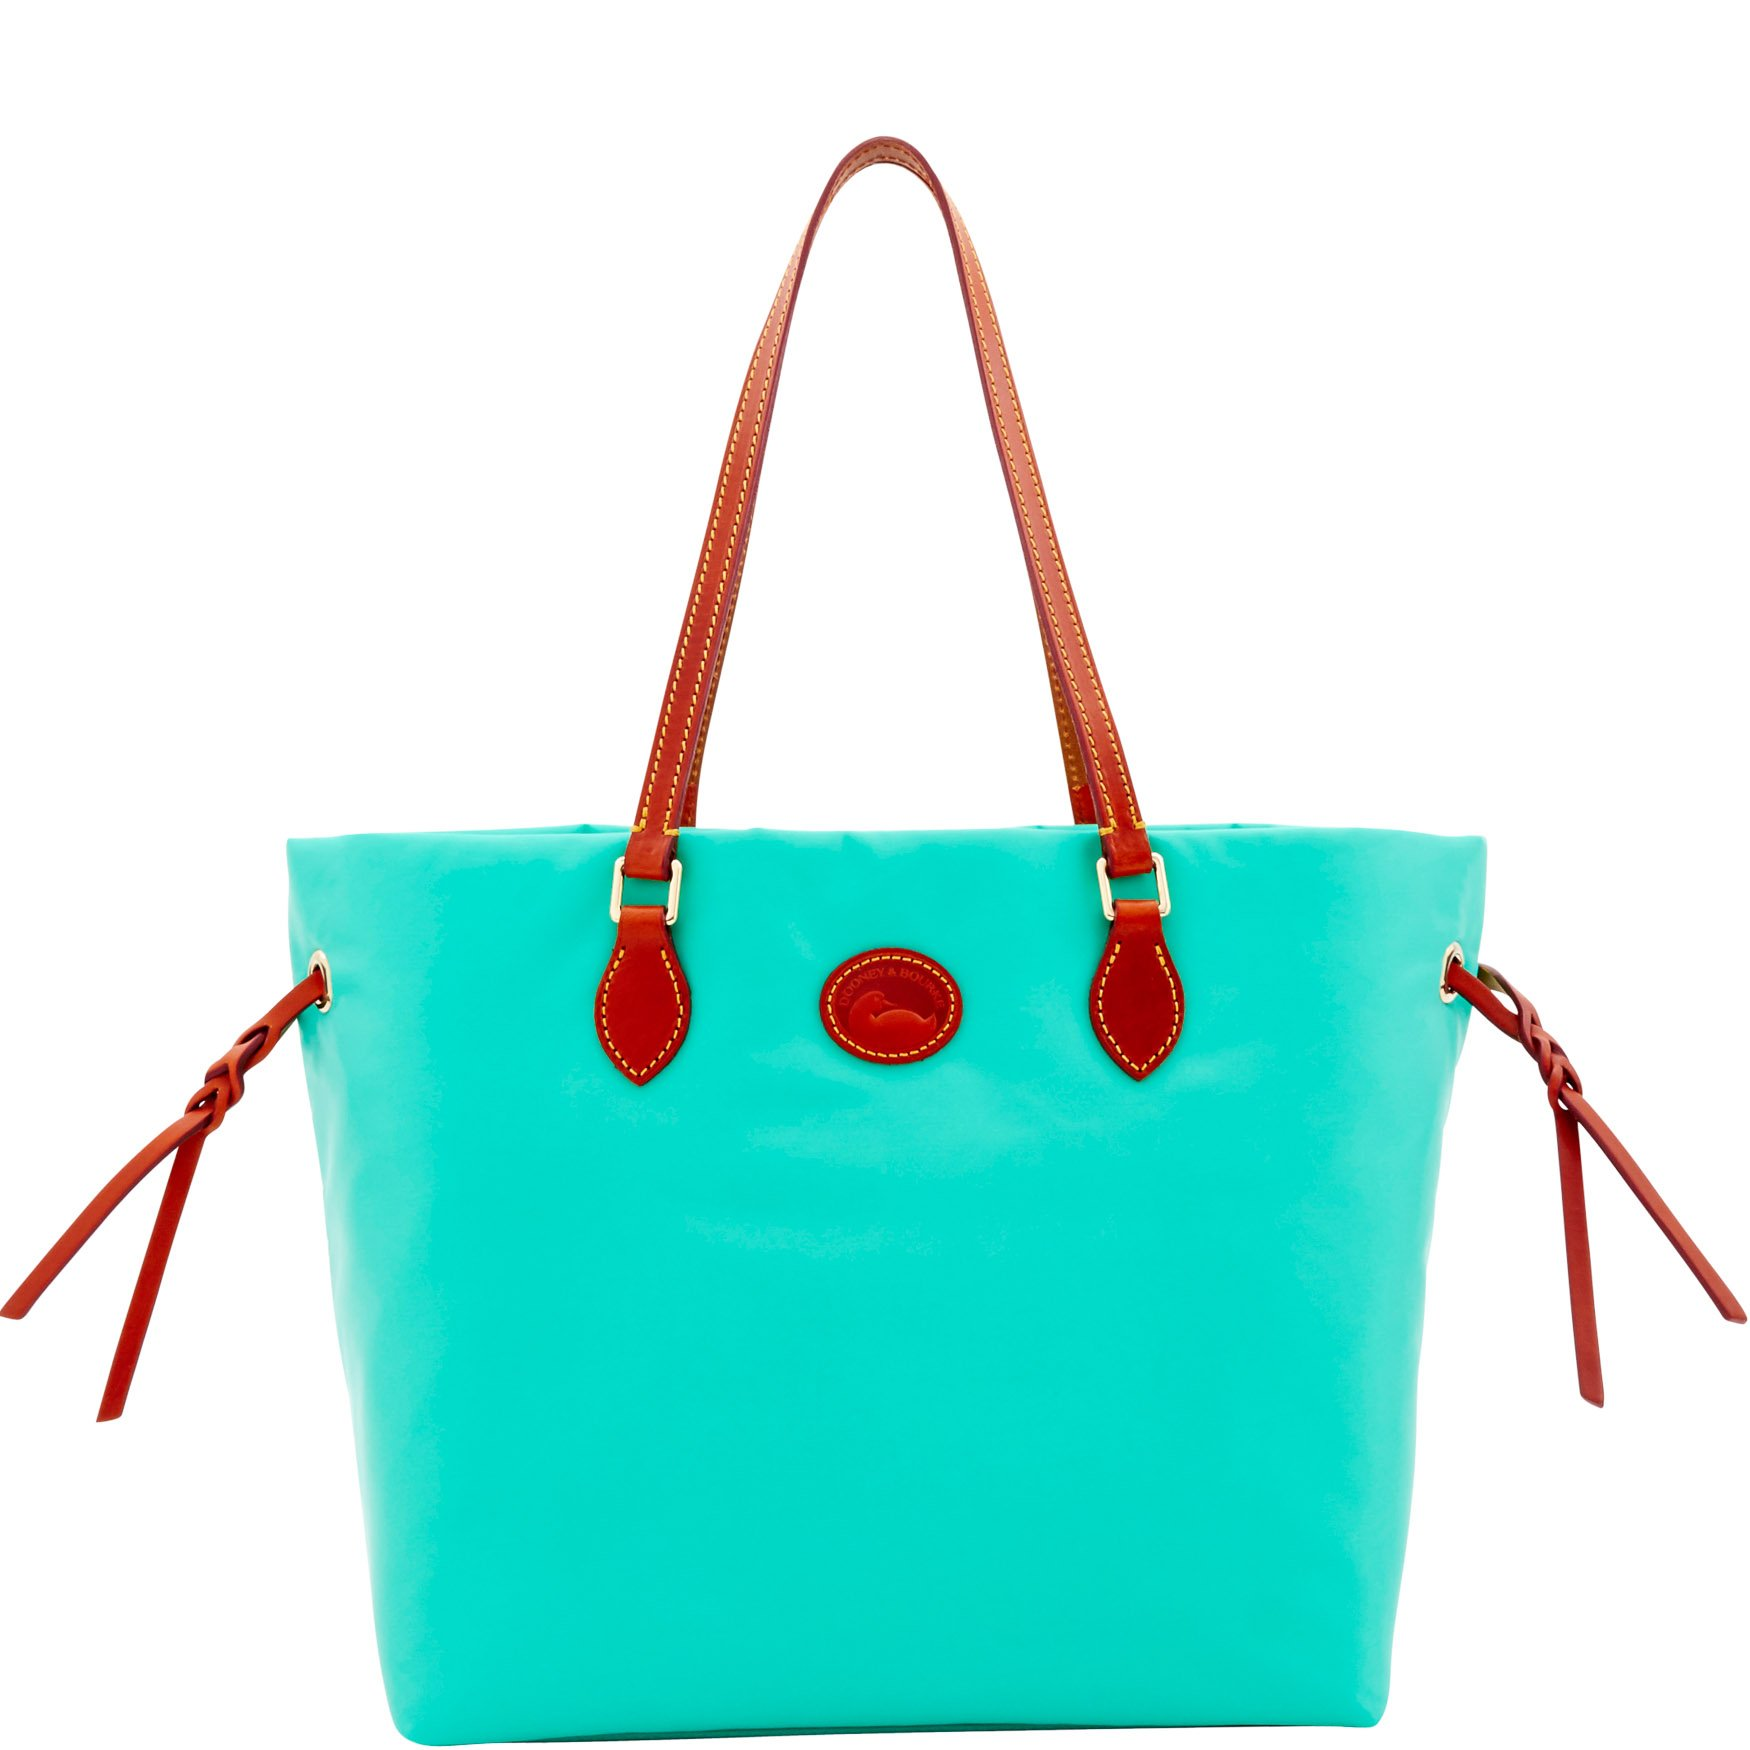 Dooney & Bourke Nylon Shopper Tote Shoulder Bag Purse, Green